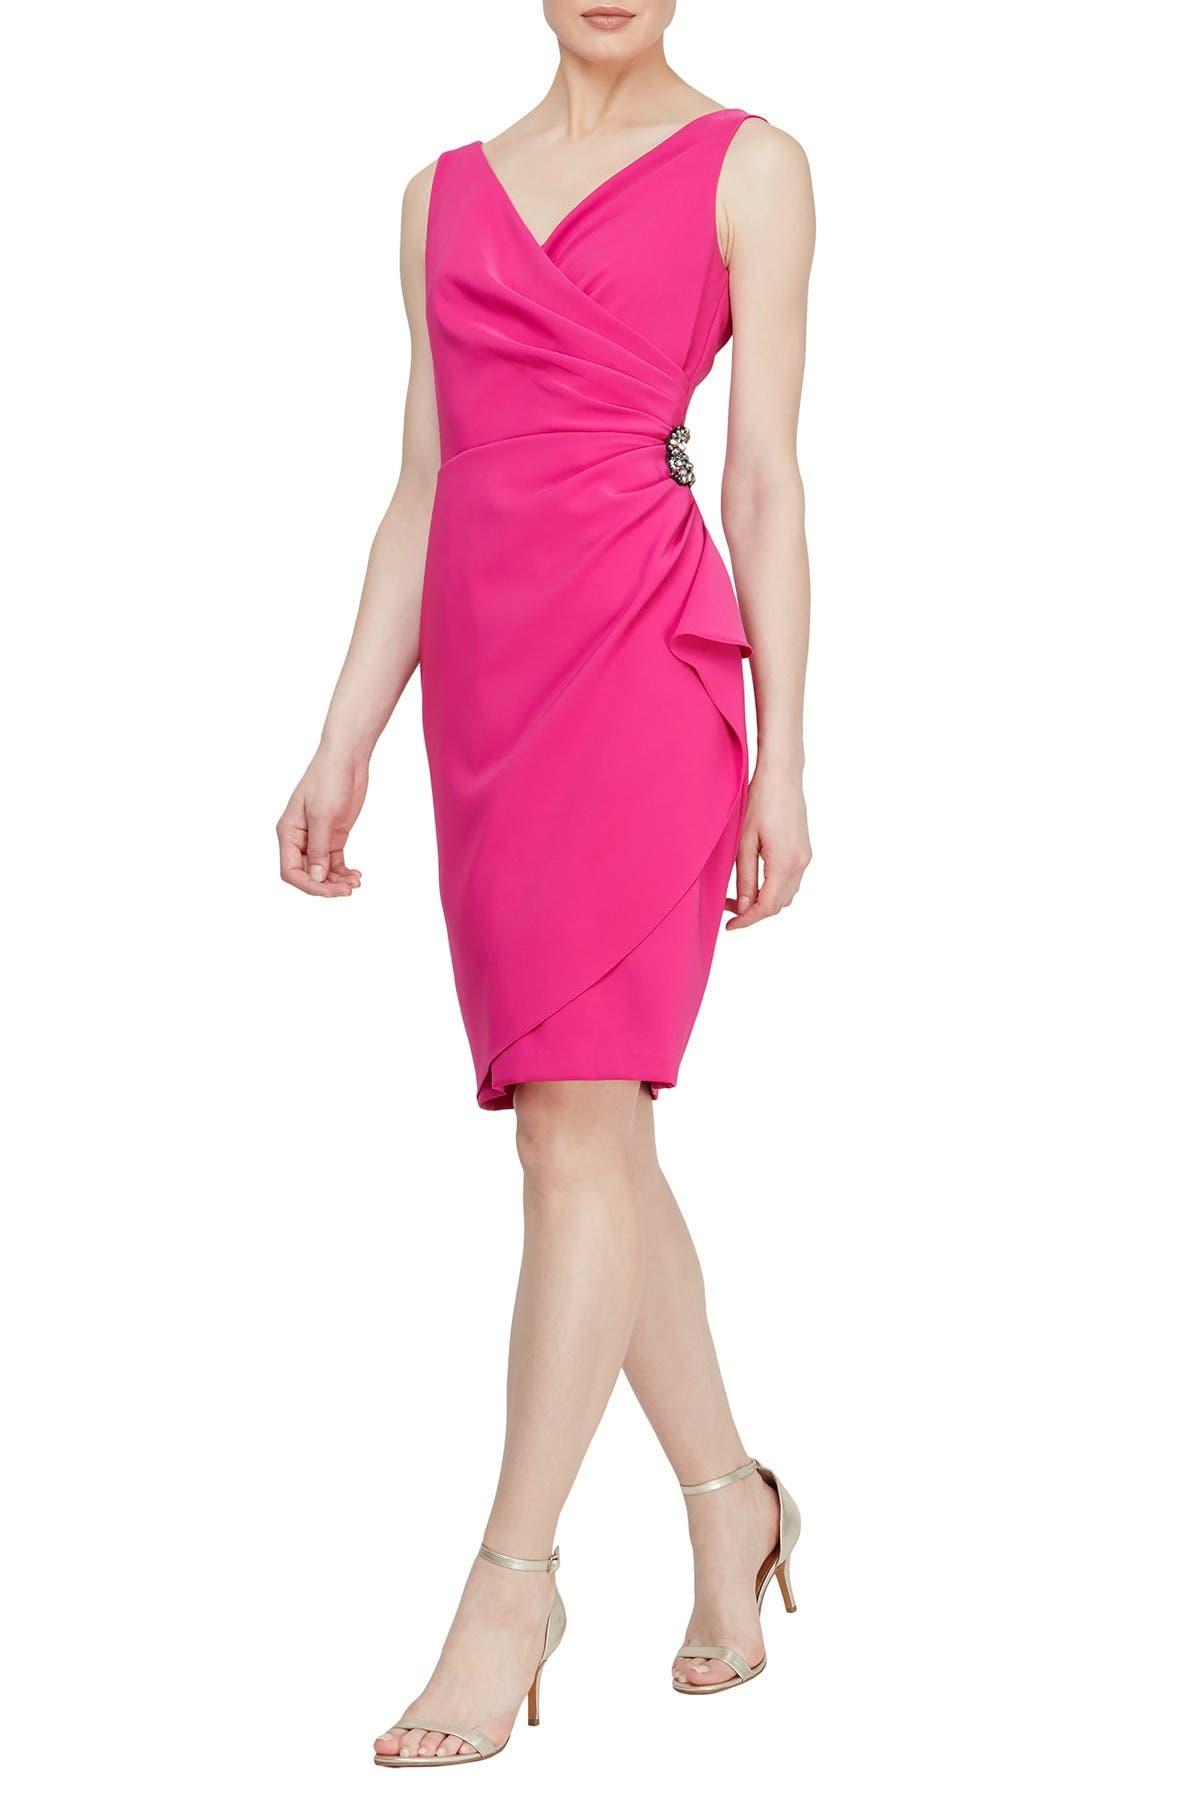 Image of SLNY V-Neck Embellished Side Gathered Dress